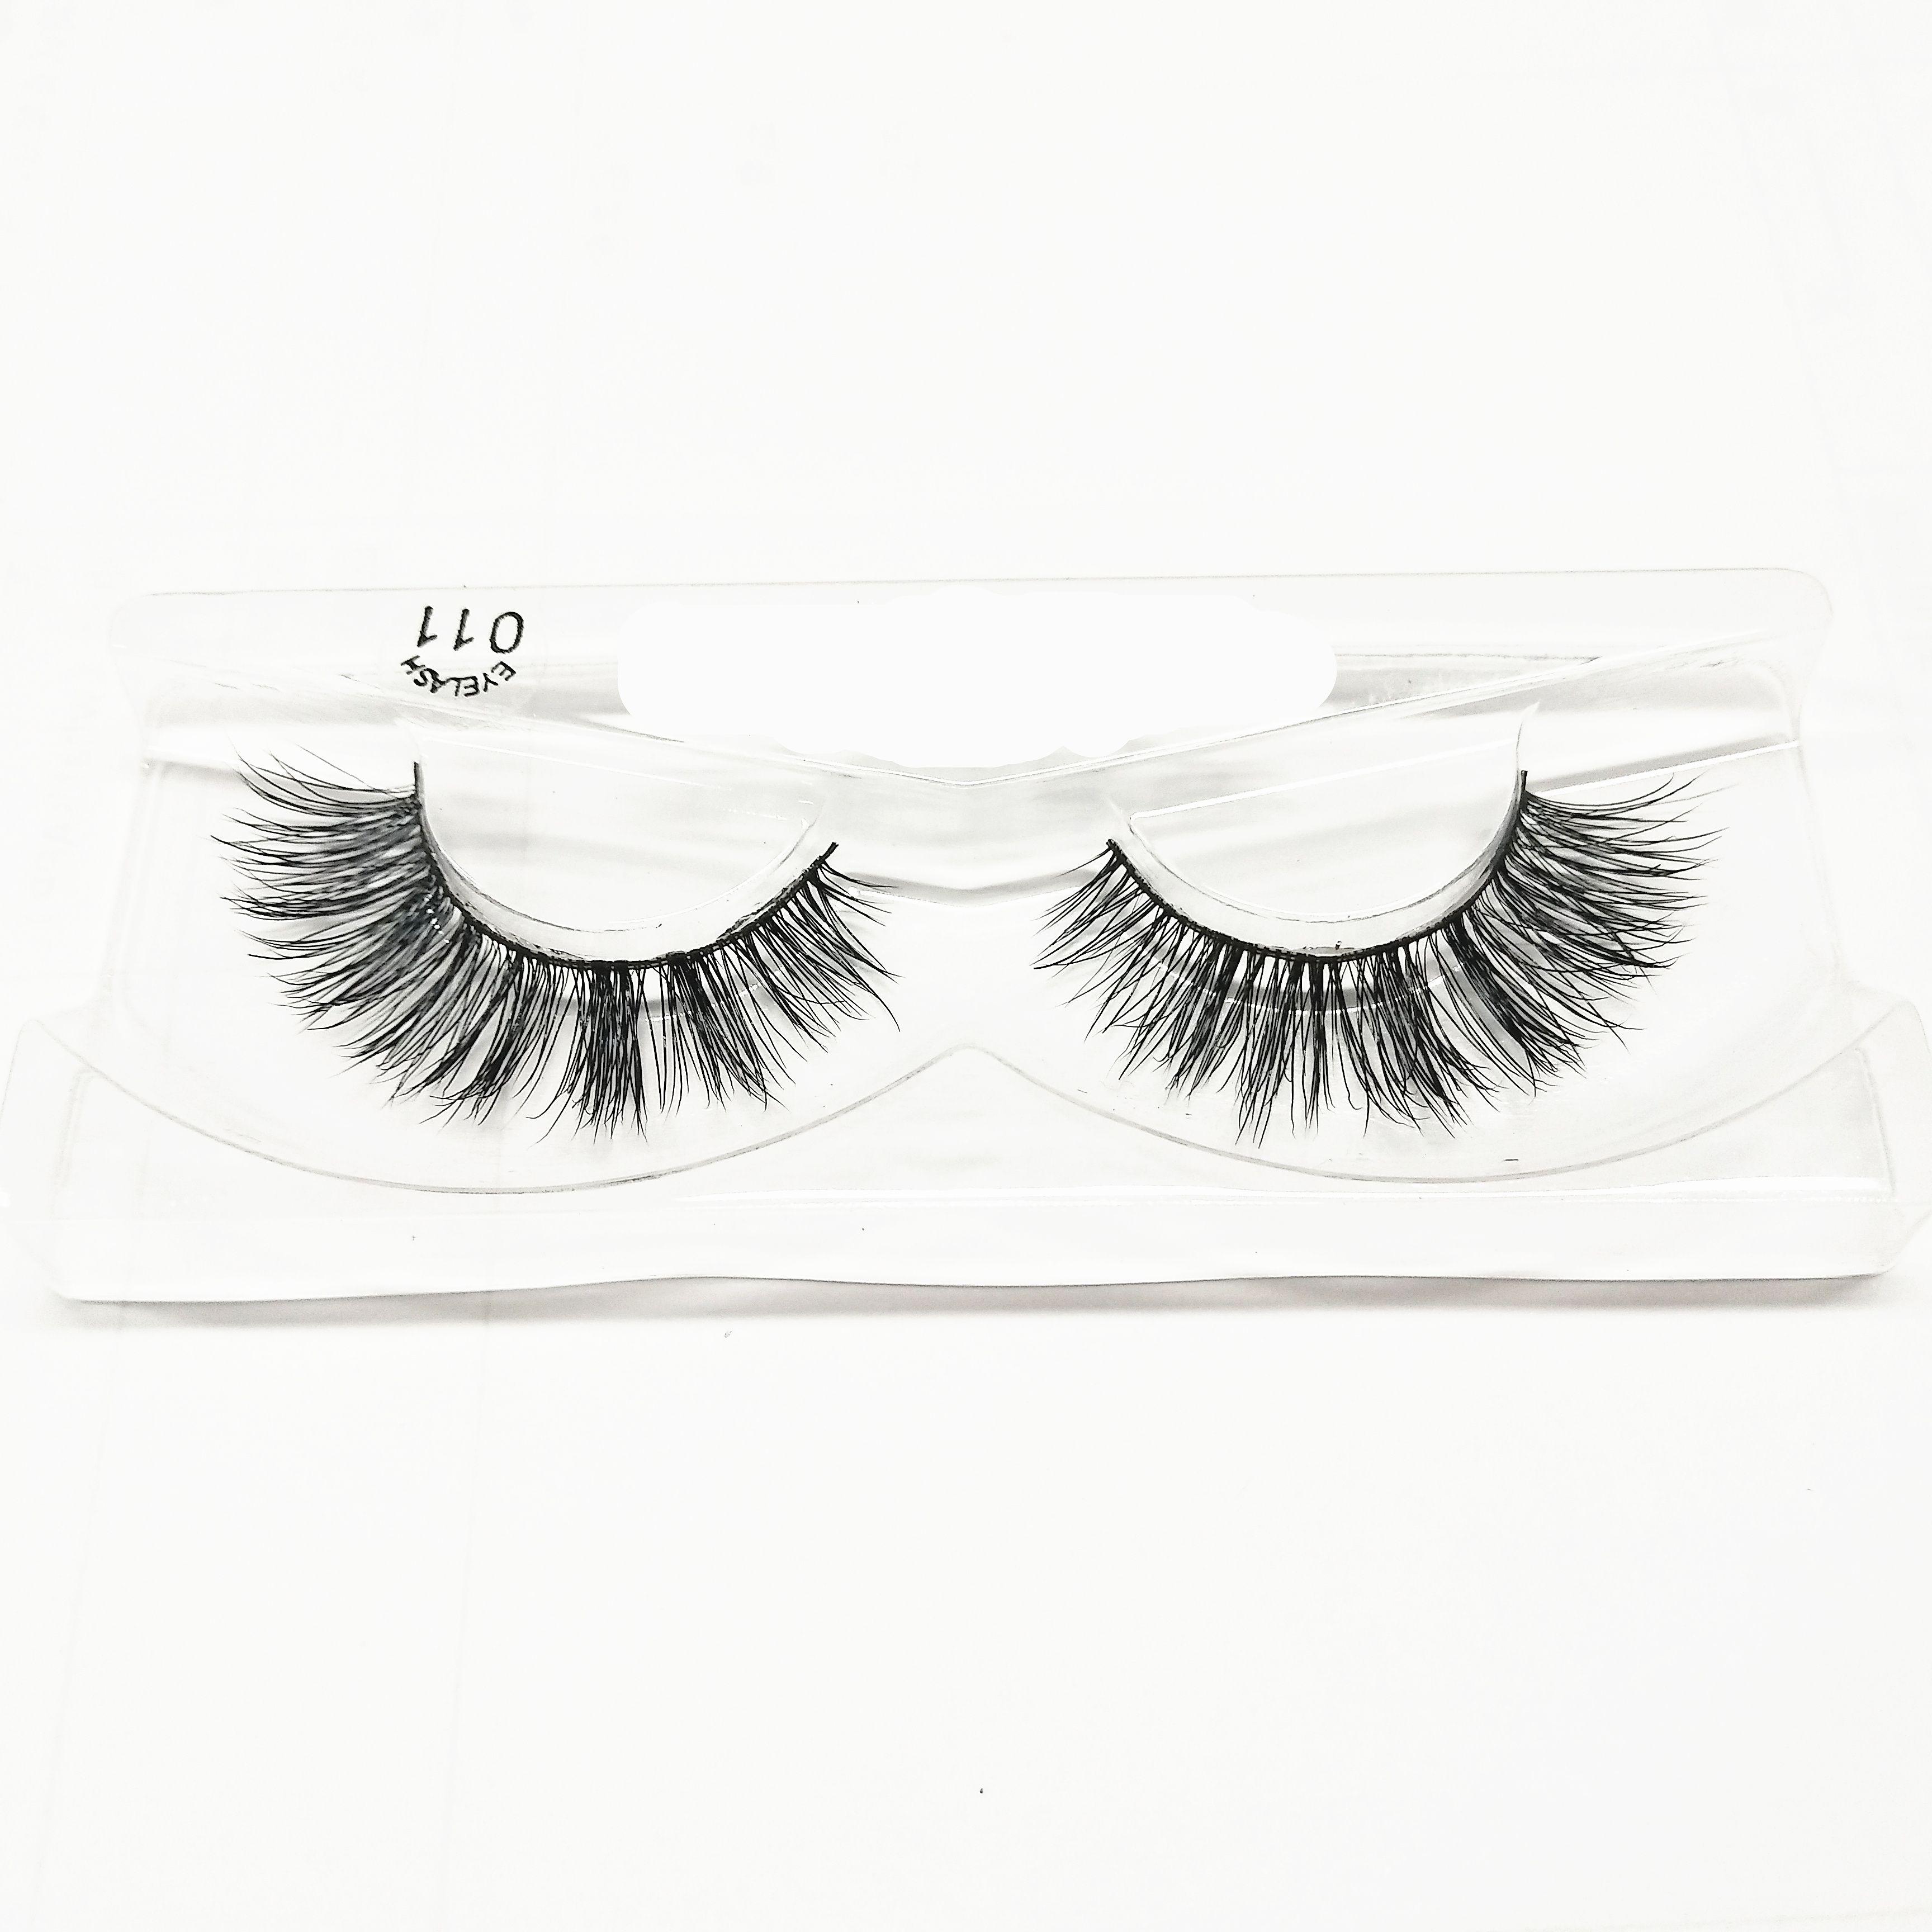 e2db93f08f3 Seashine Hand Made Type And 100% Real Mink Fur 3D Mink Eyelashes False  Lashes Eye Lashes Eyelash Serum From Lashworld, $1.83| DHgate.Com